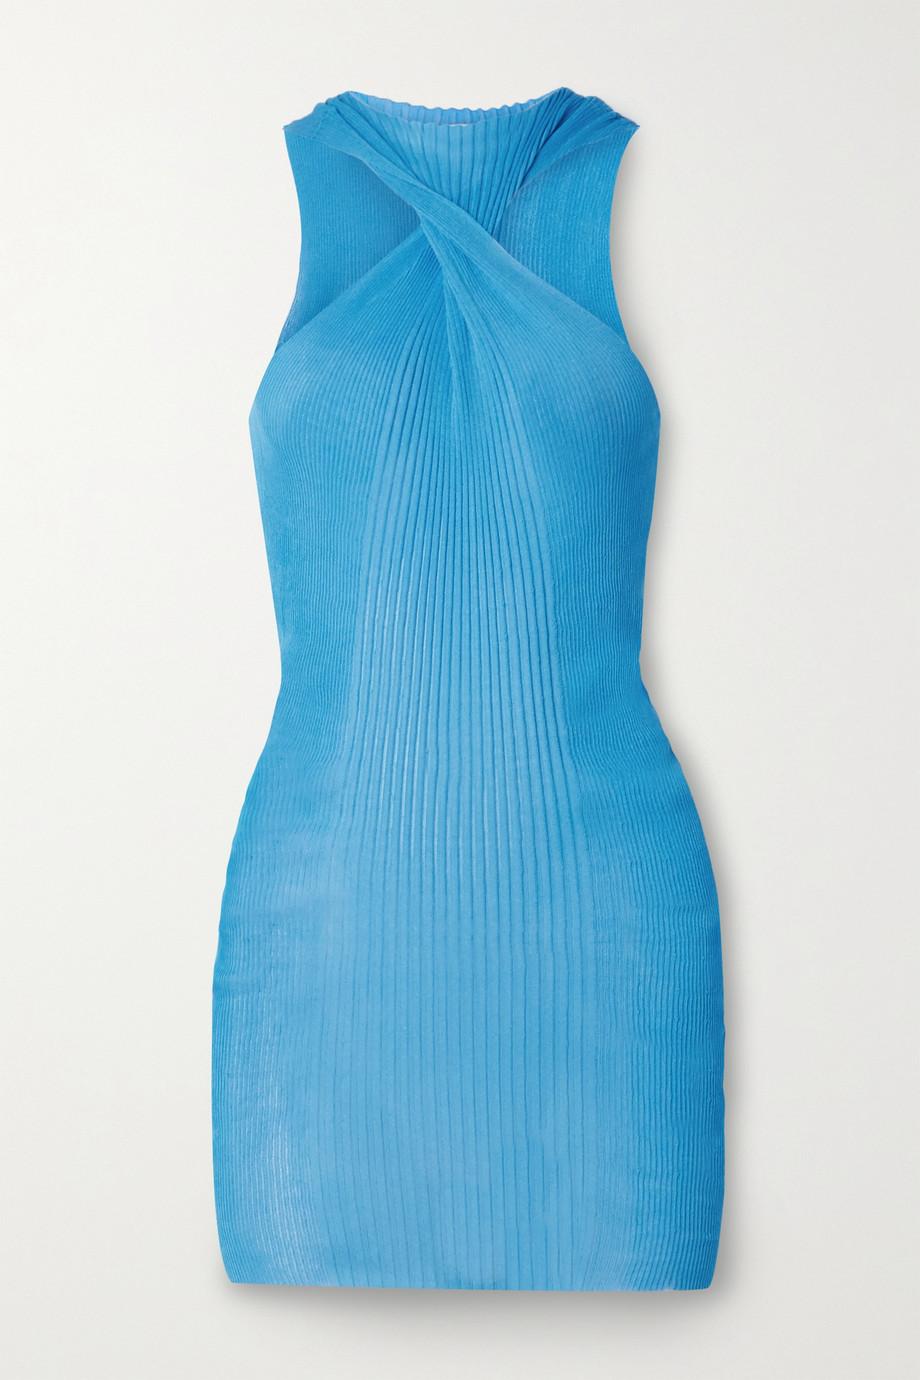 Bottega Veneta Twist-front ribbed cotton and silk-blend tank